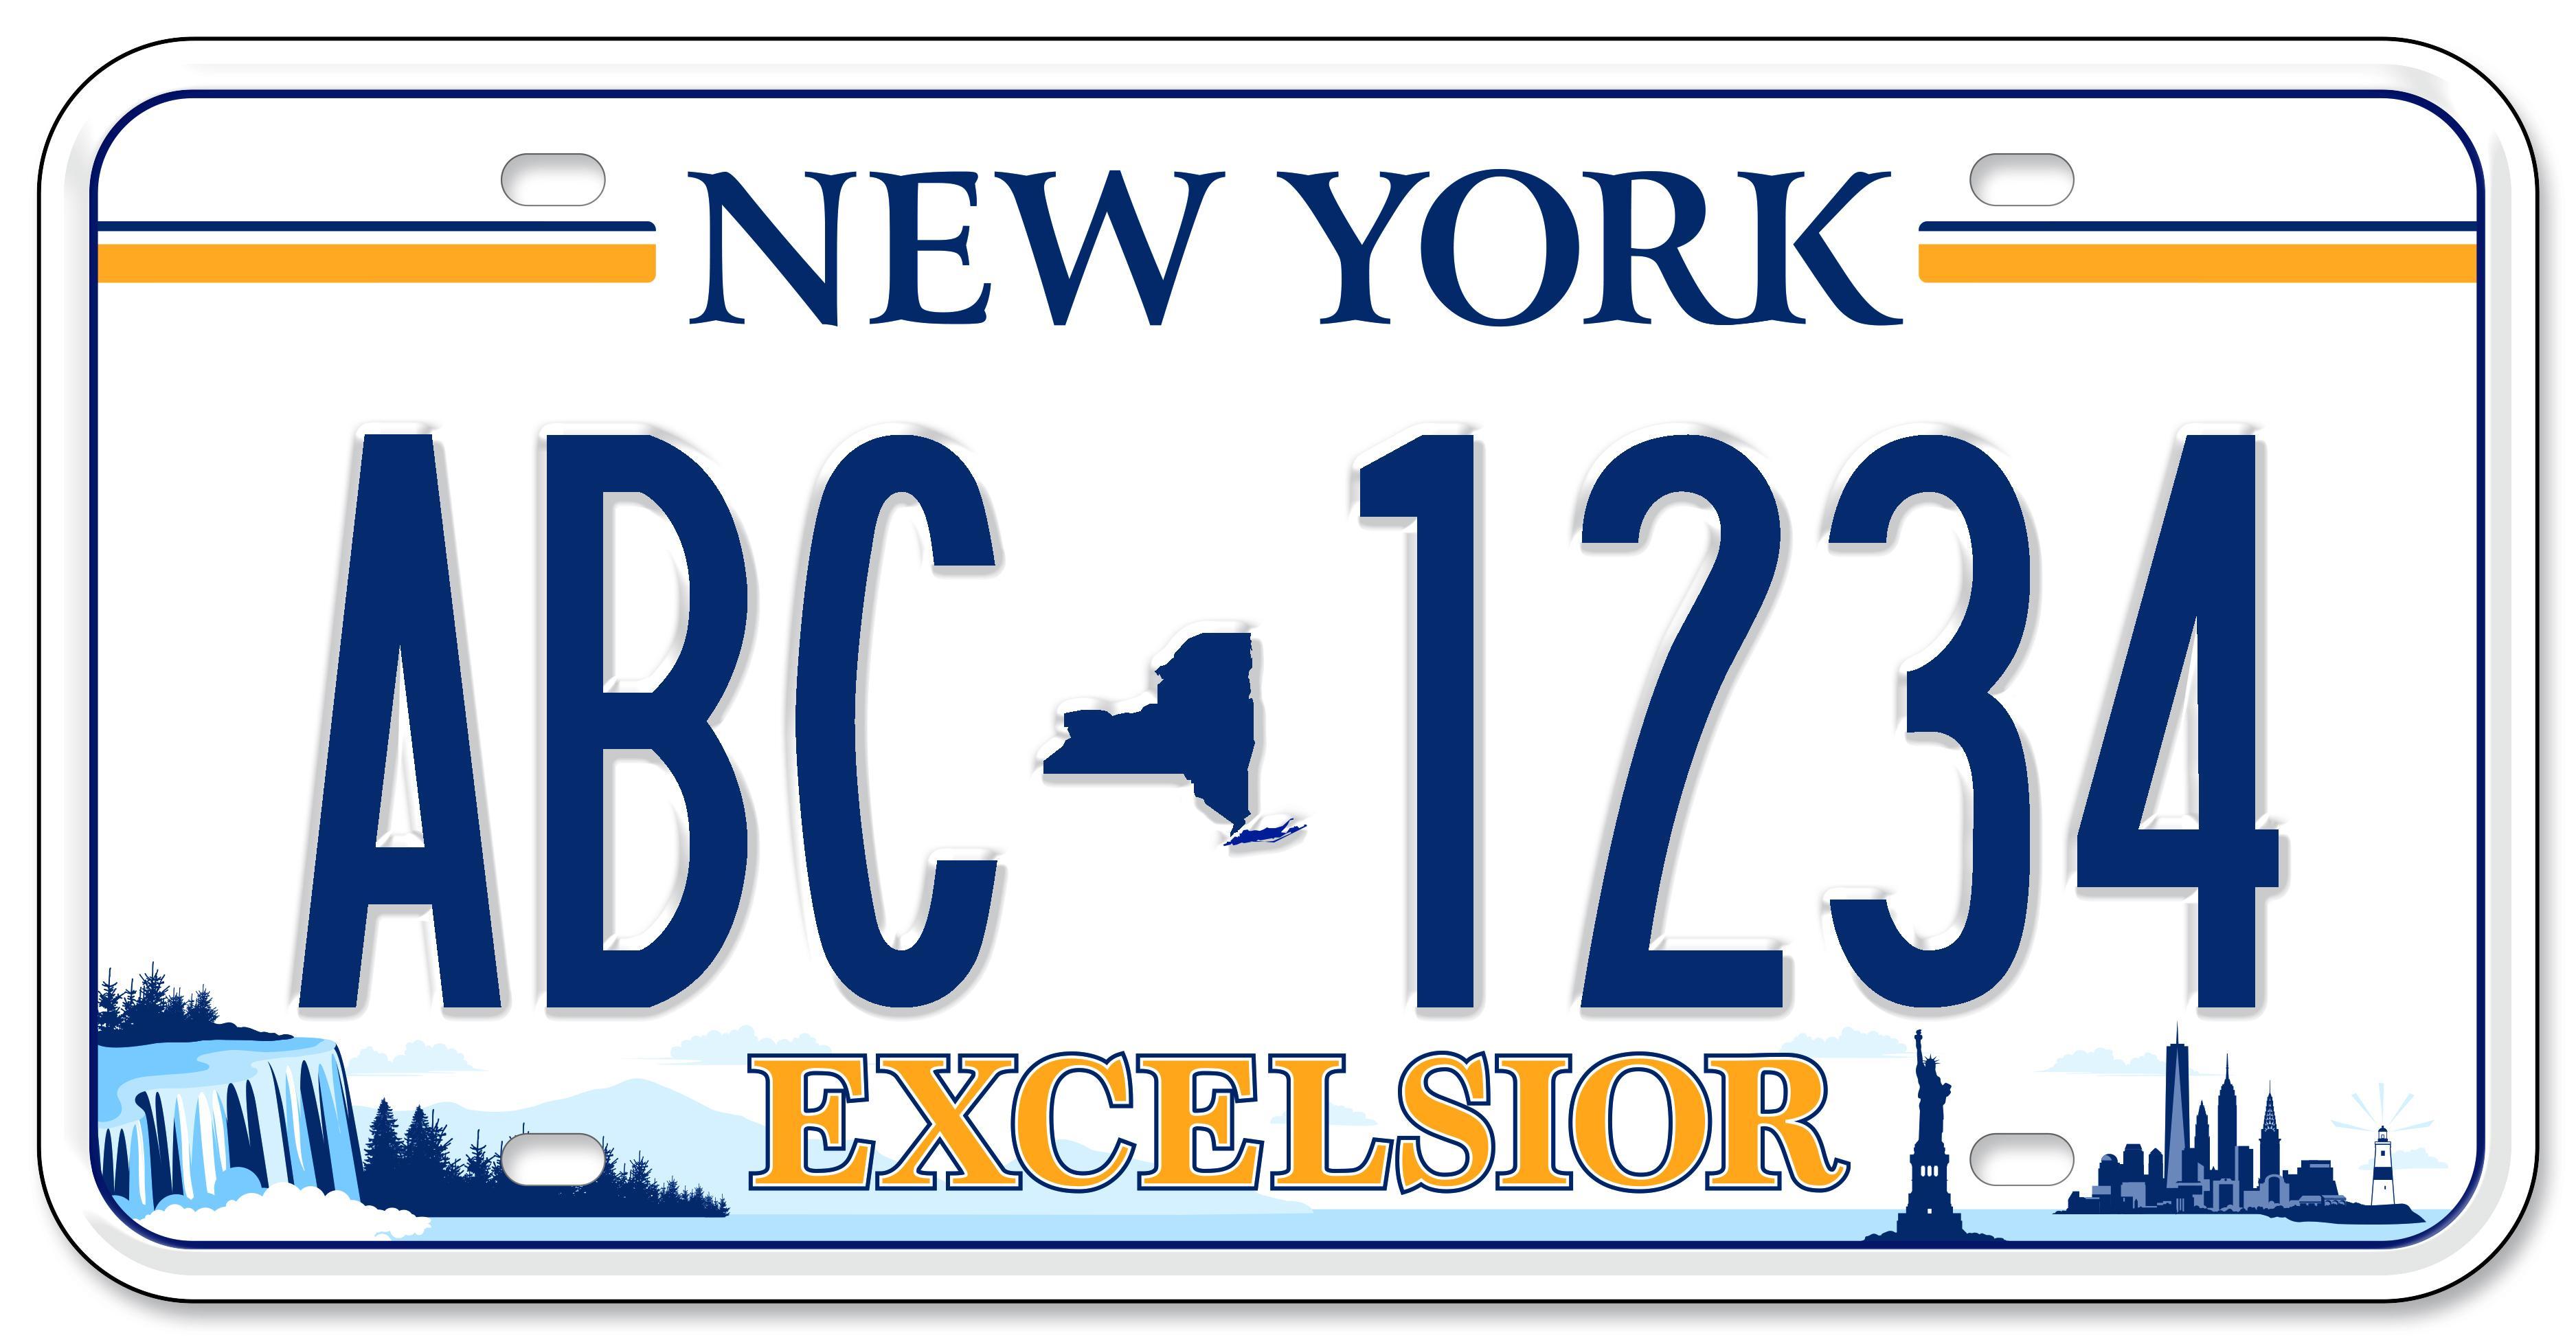 New York license plate design with state landmarks across the bottom